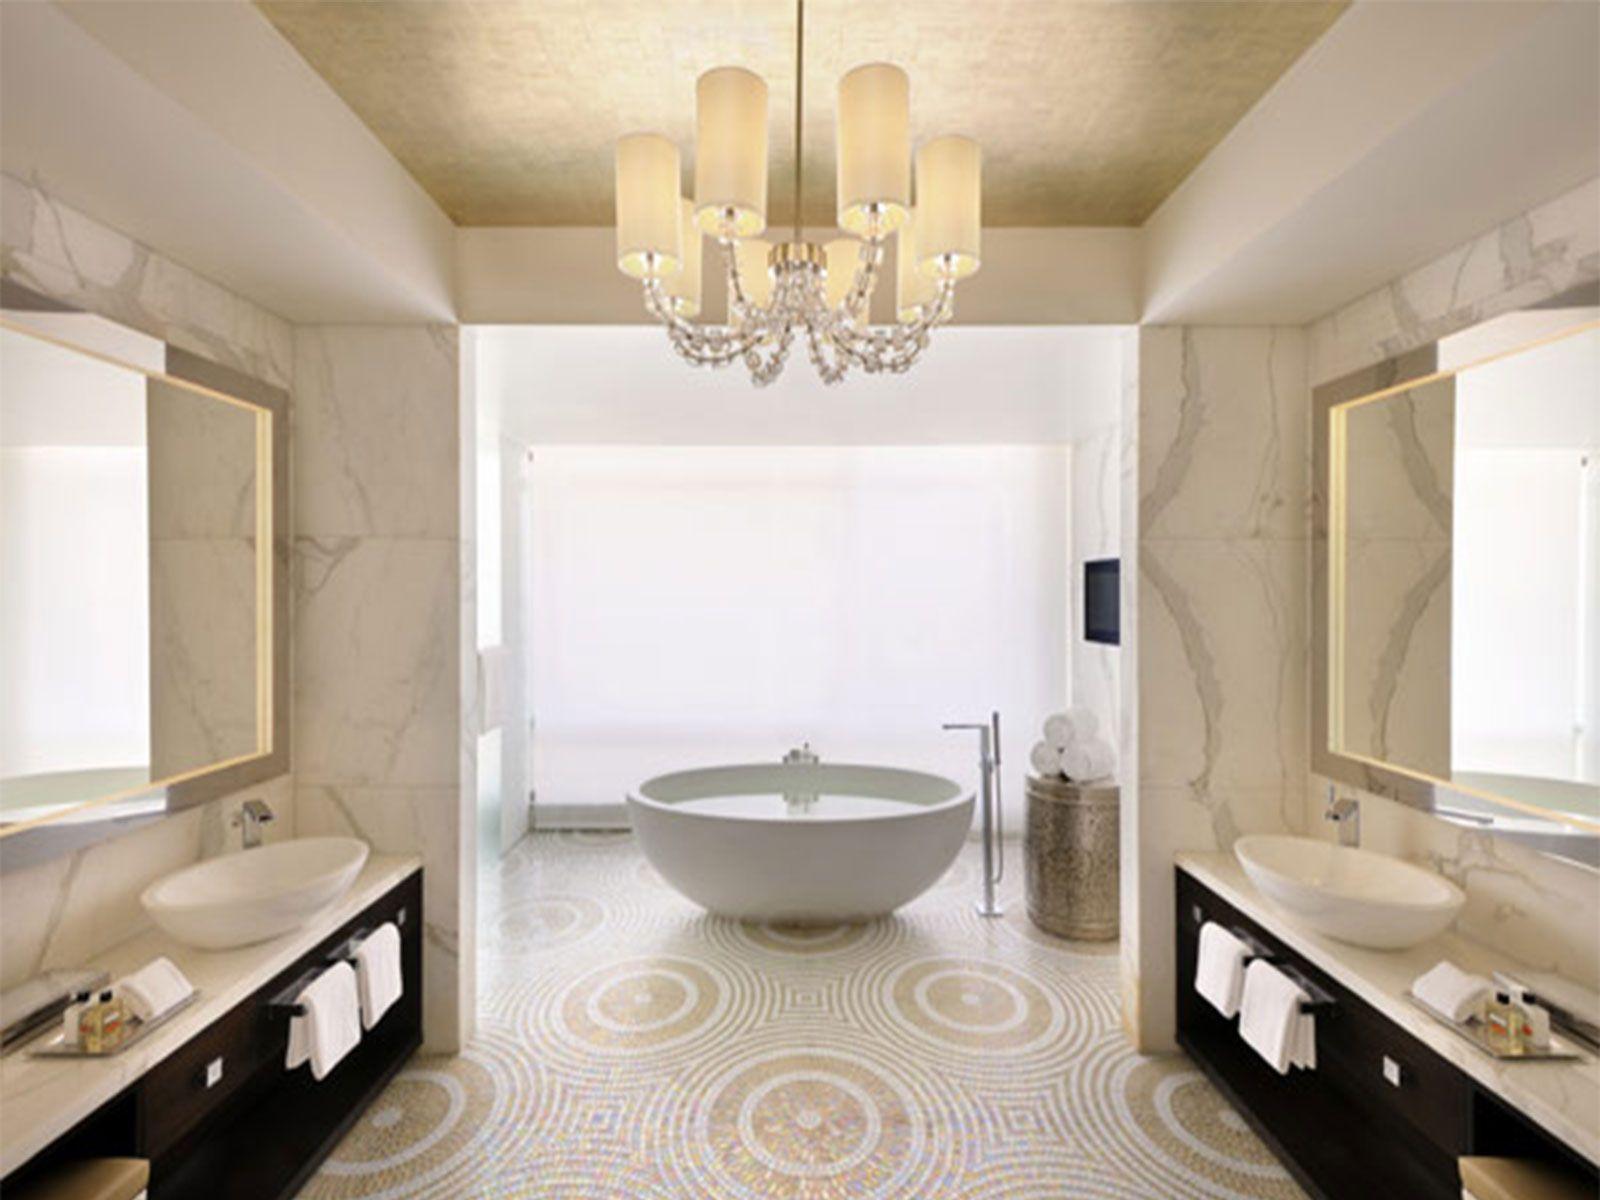 Luxury Bathroom at Luxury Architecture Hotel Ideas | hotel ...